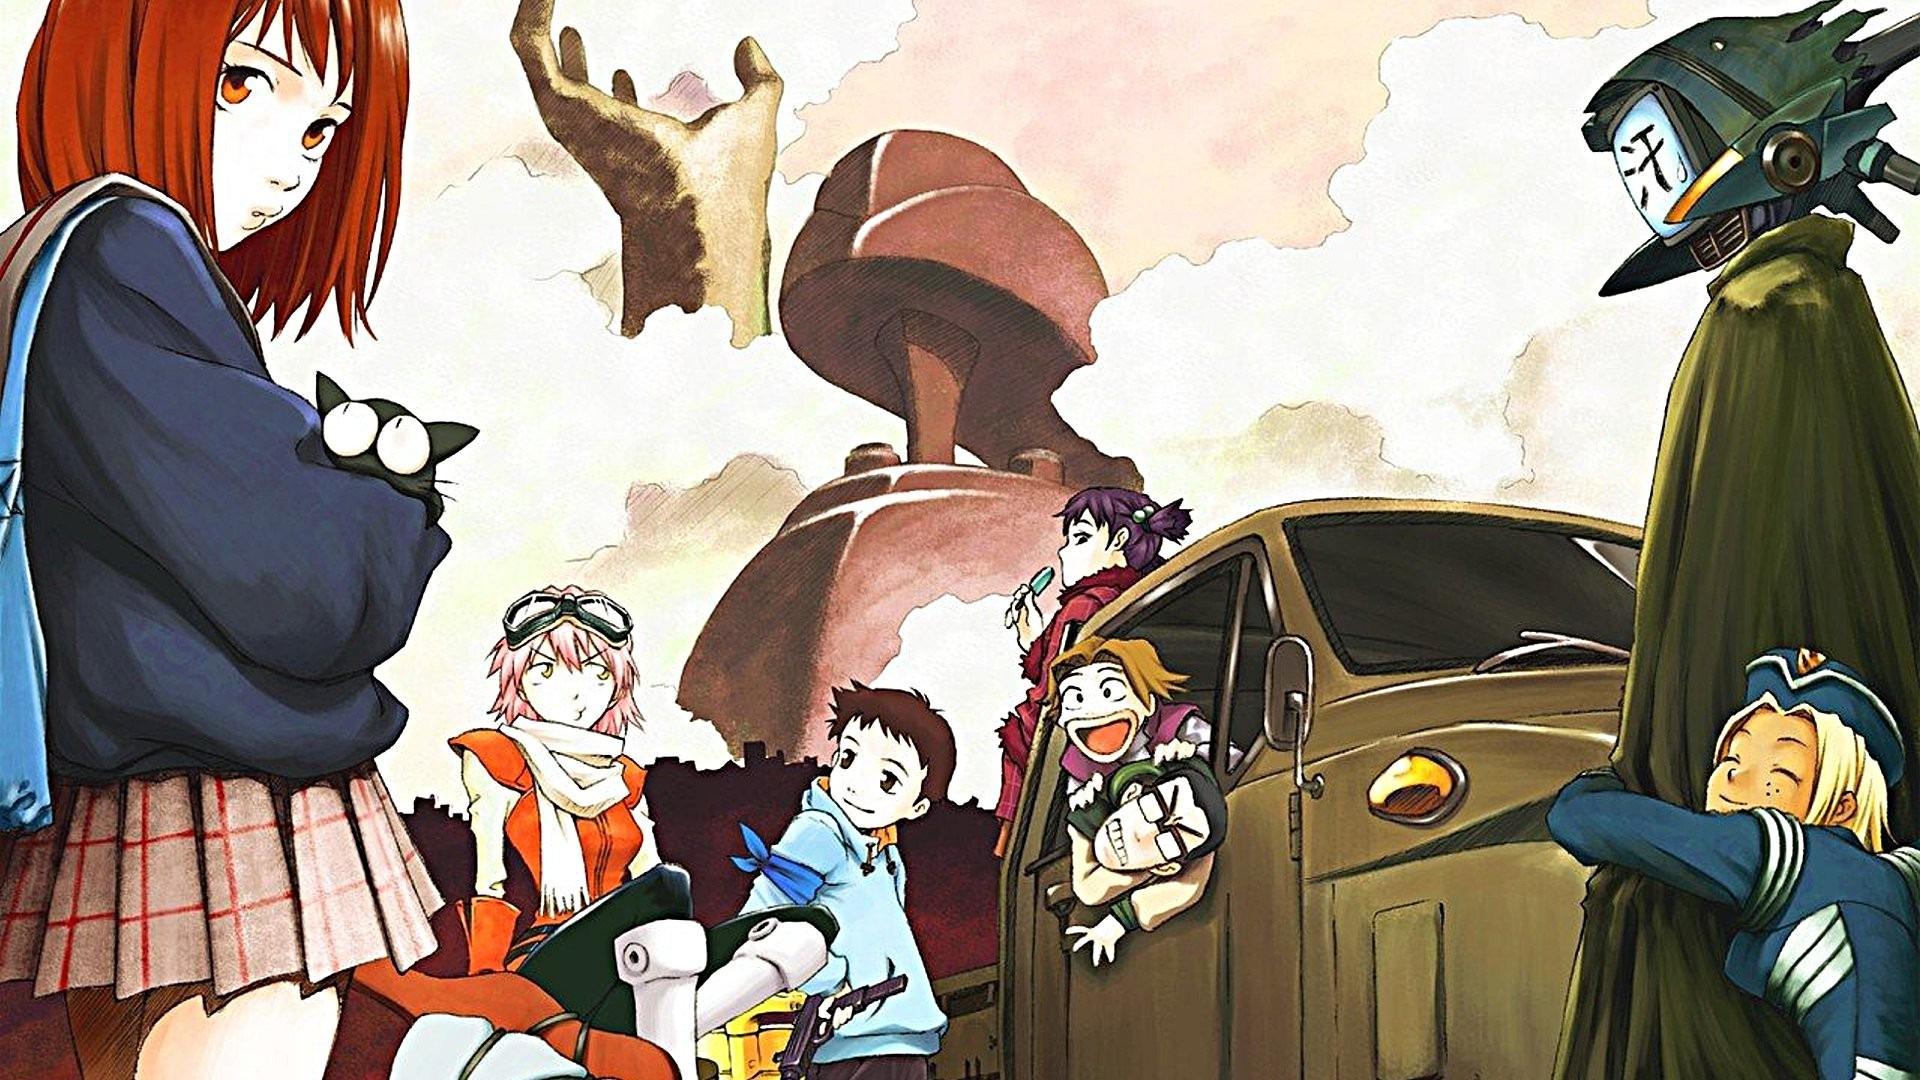 Anime FLCL